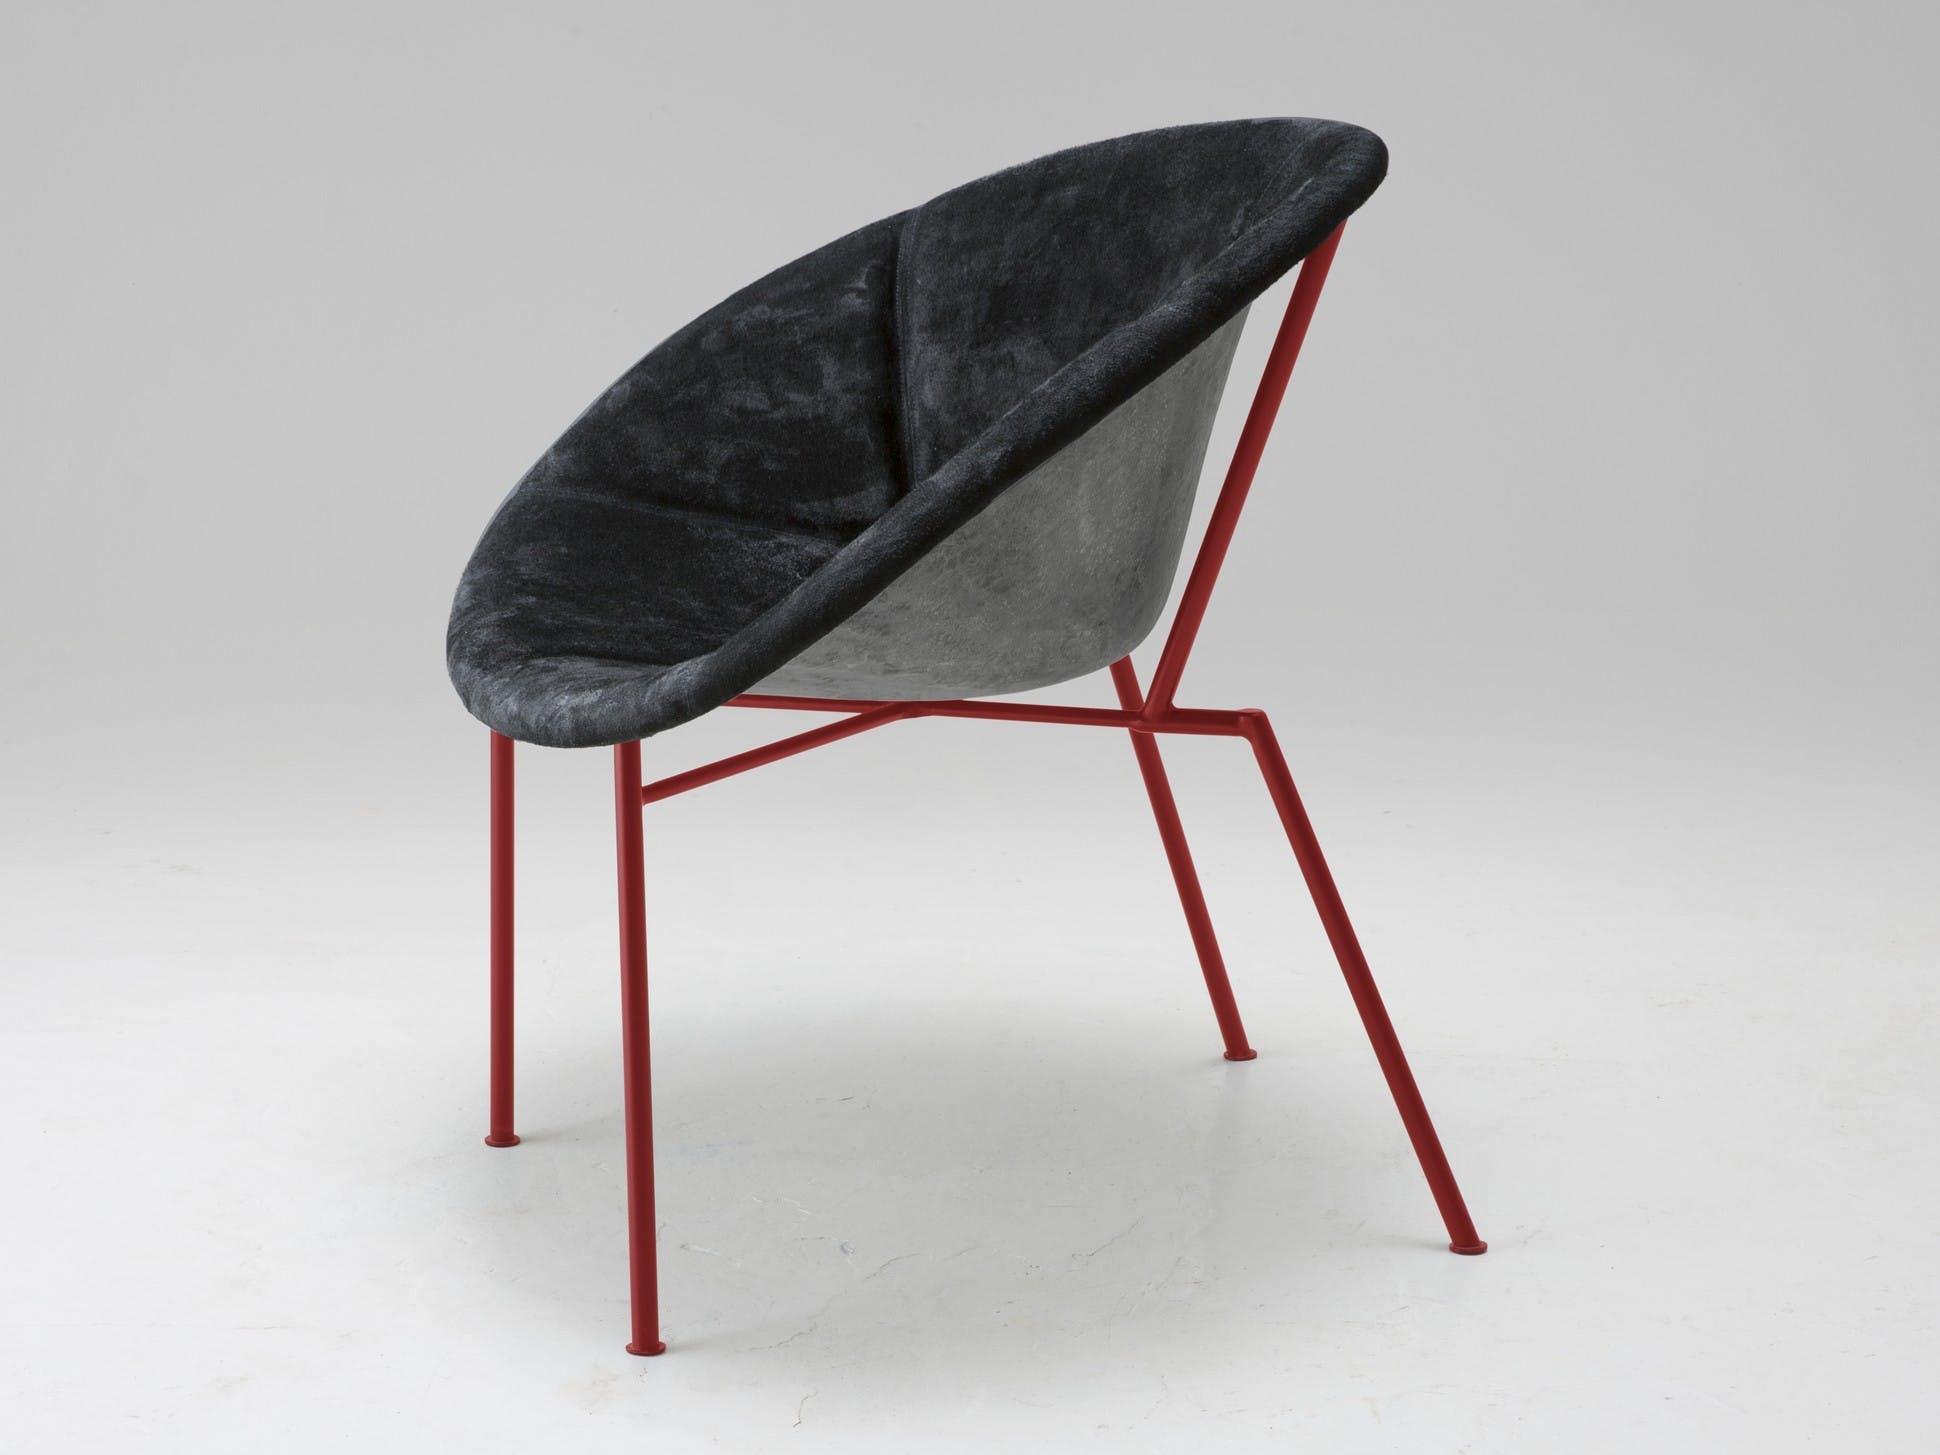 Imperfetto-lab-side-cushion-olivia-haute-living